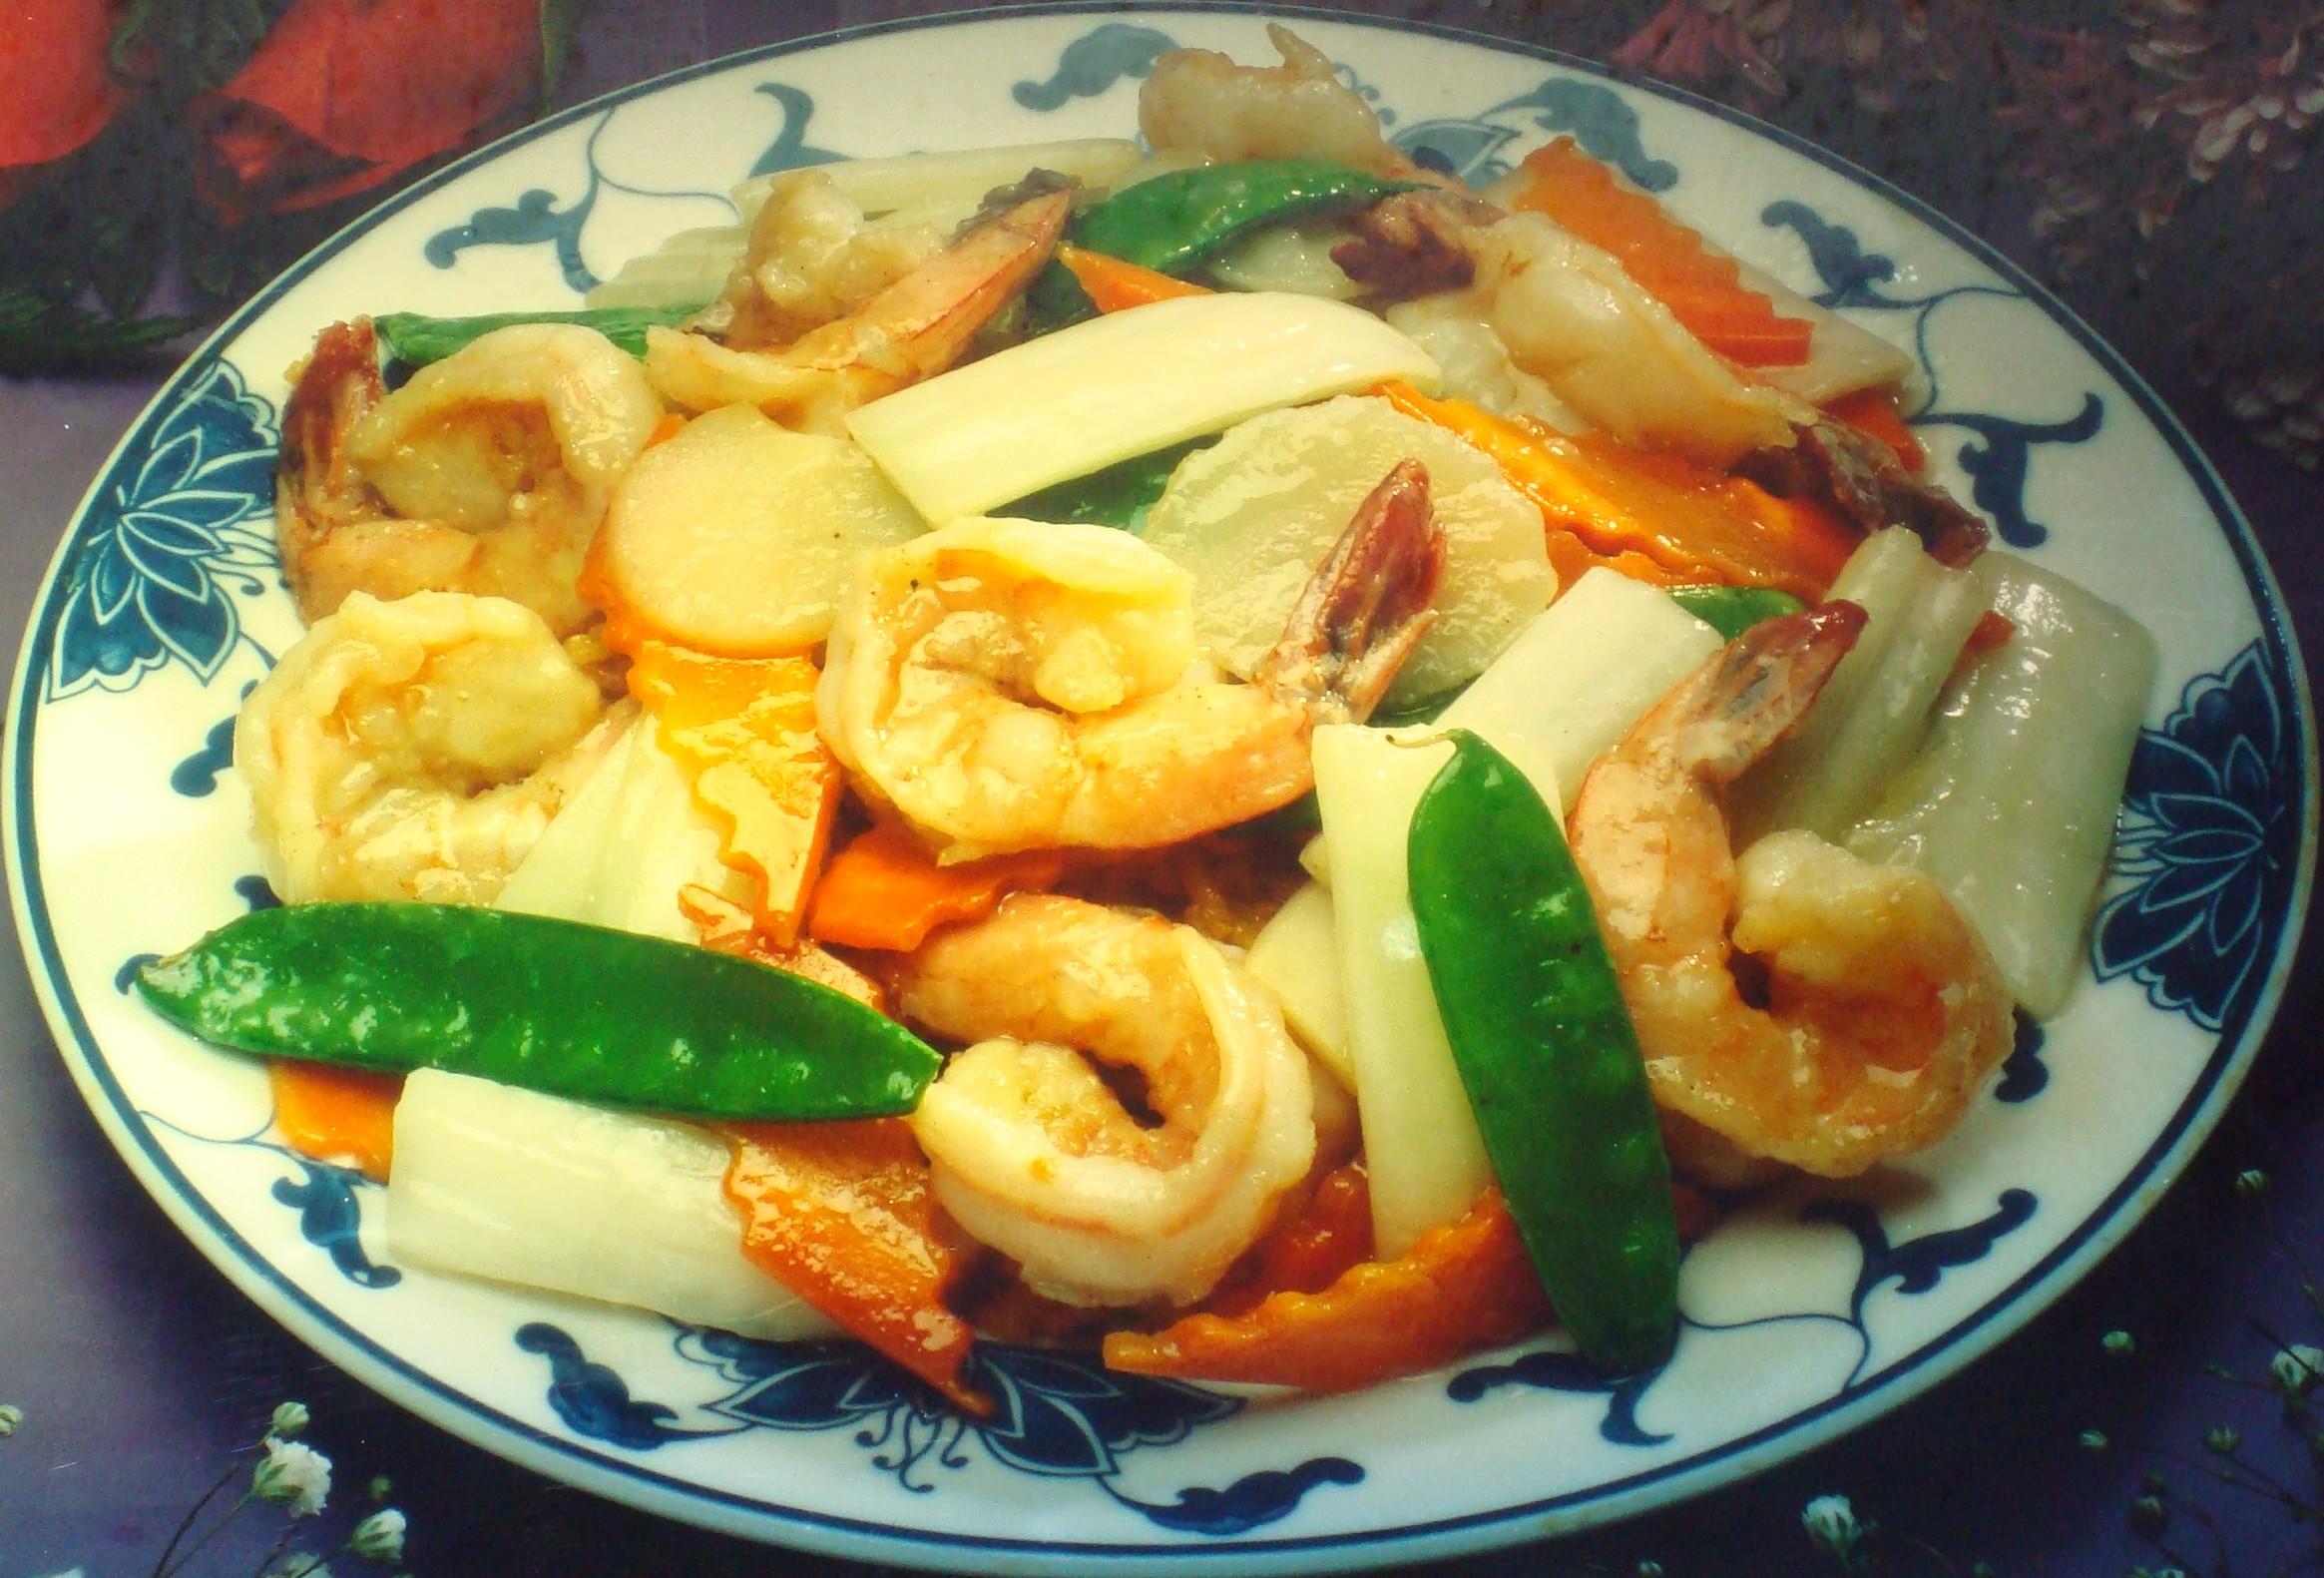 Chinese Food Corpus Christi Tx